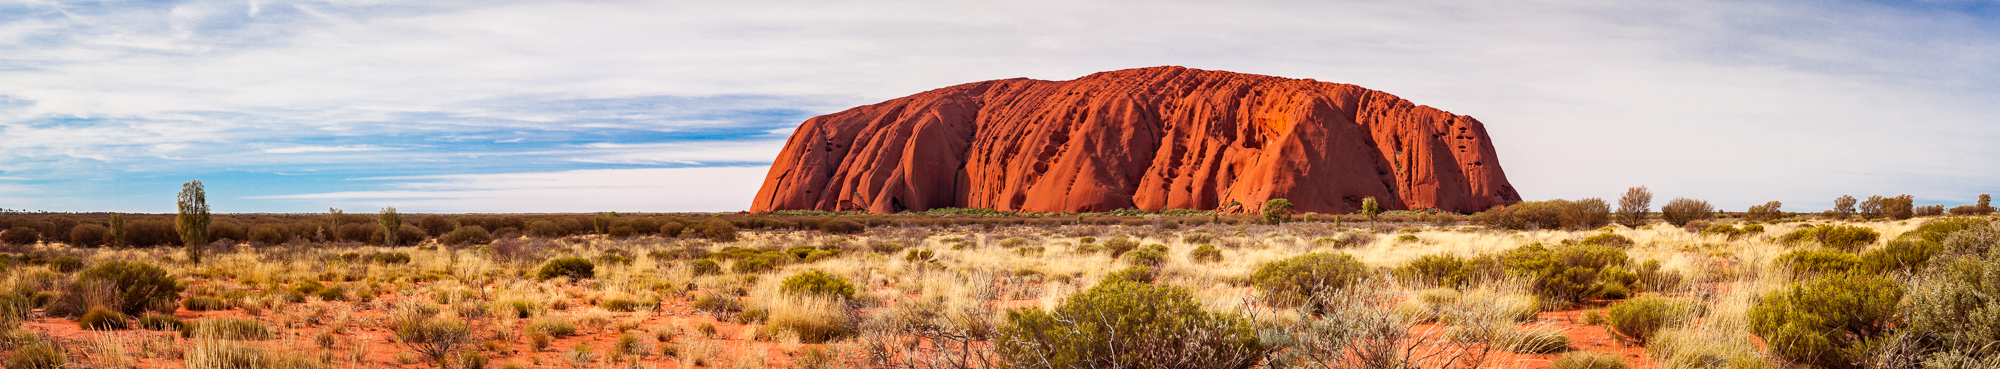 Eyers Roch Australien Panorama